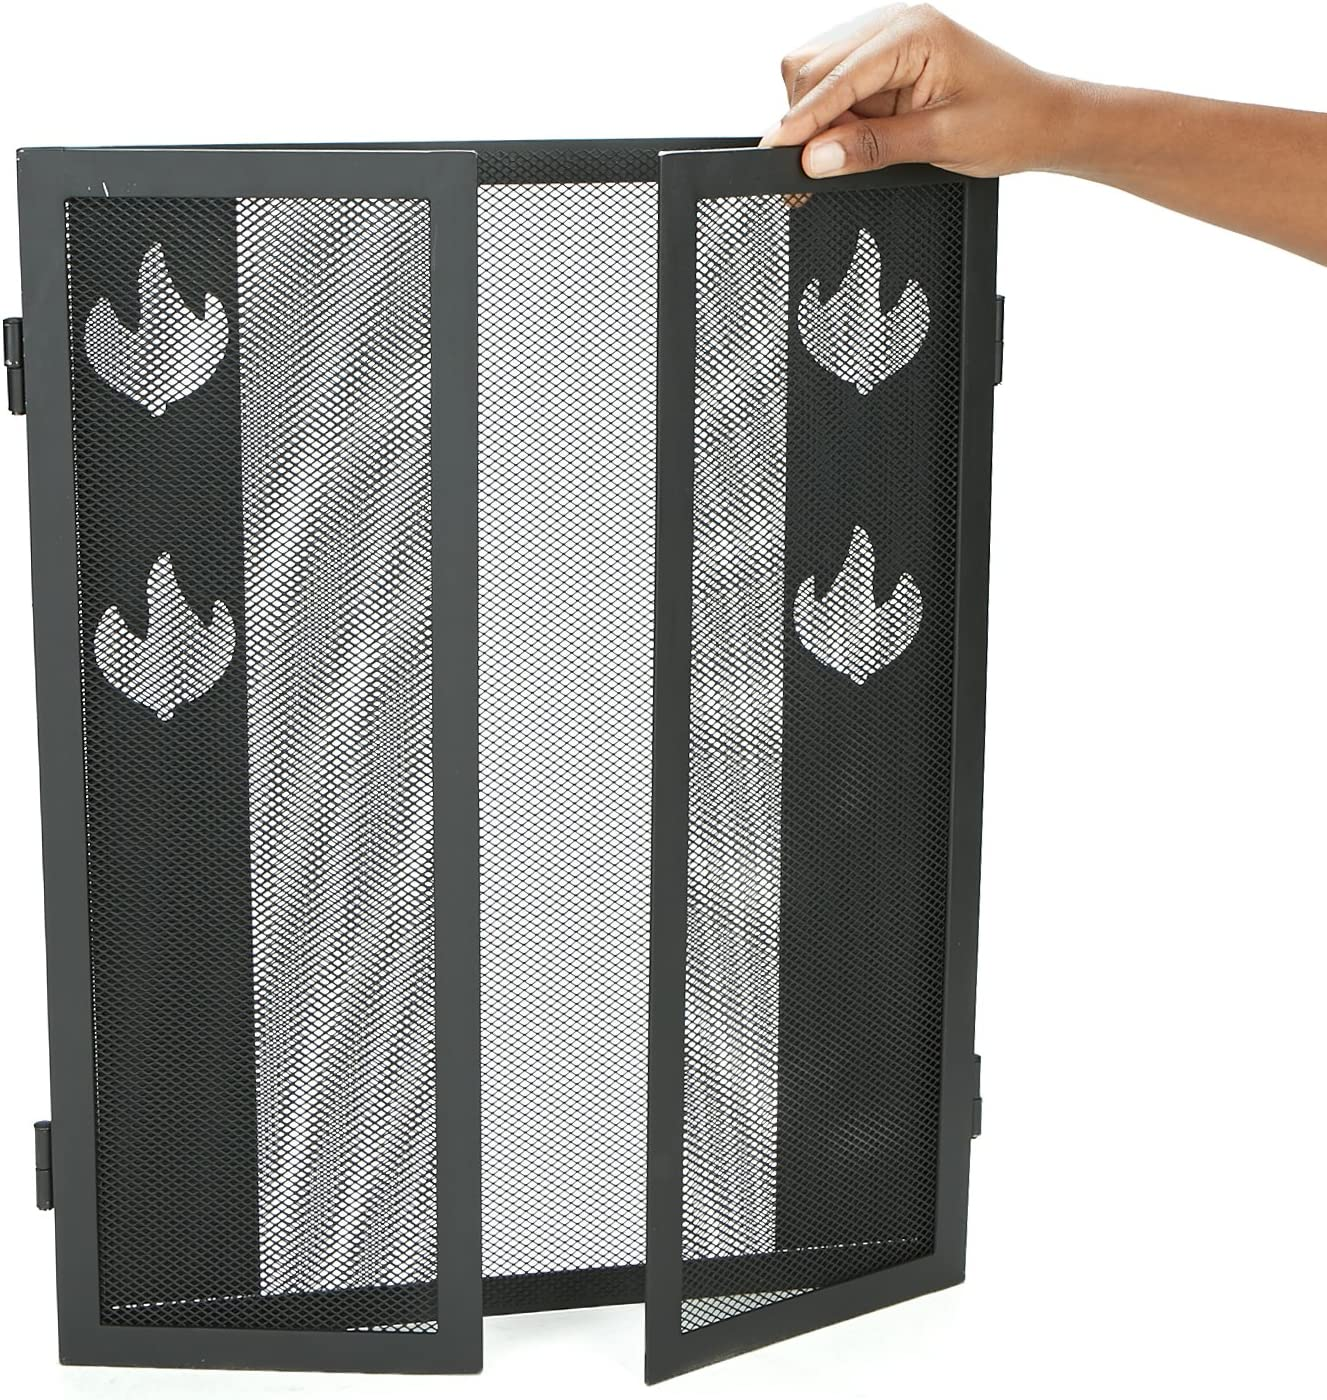 Black Mind Reader SCREENDP-BLK Fireplace Accessories